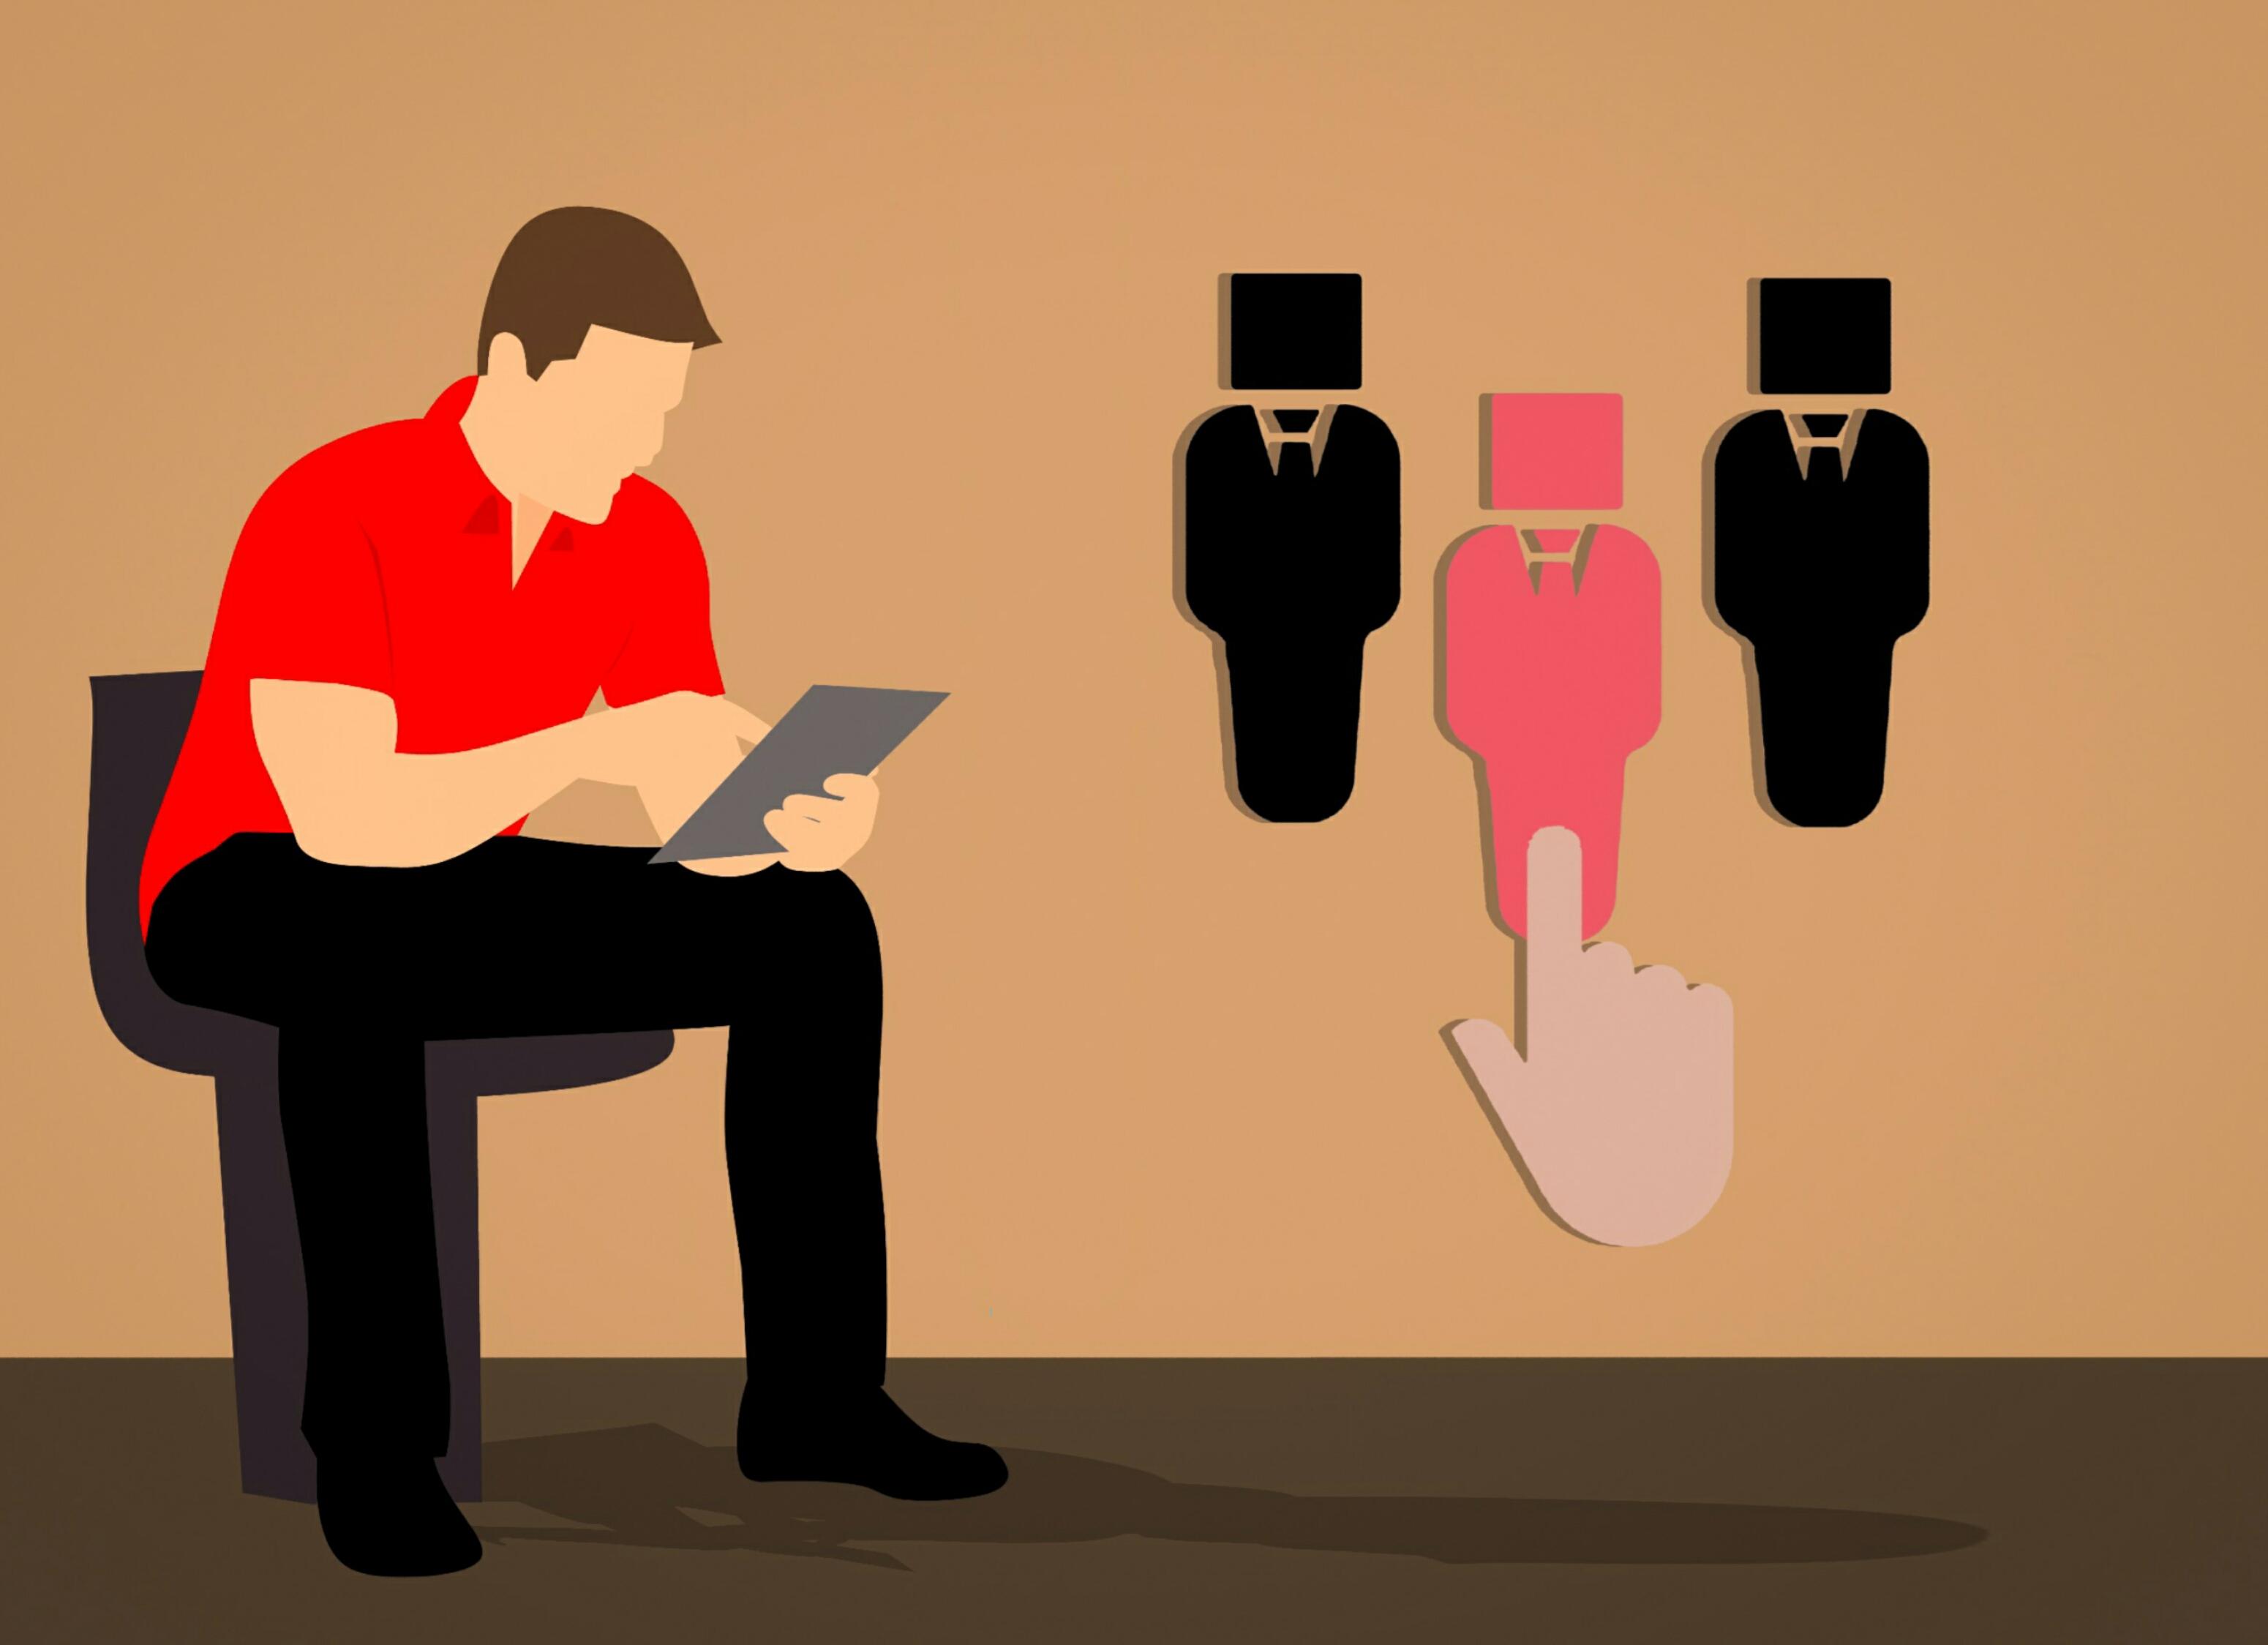 hiring-hr-recruitment-job-selection-process-interview-1578383-pxhere.com